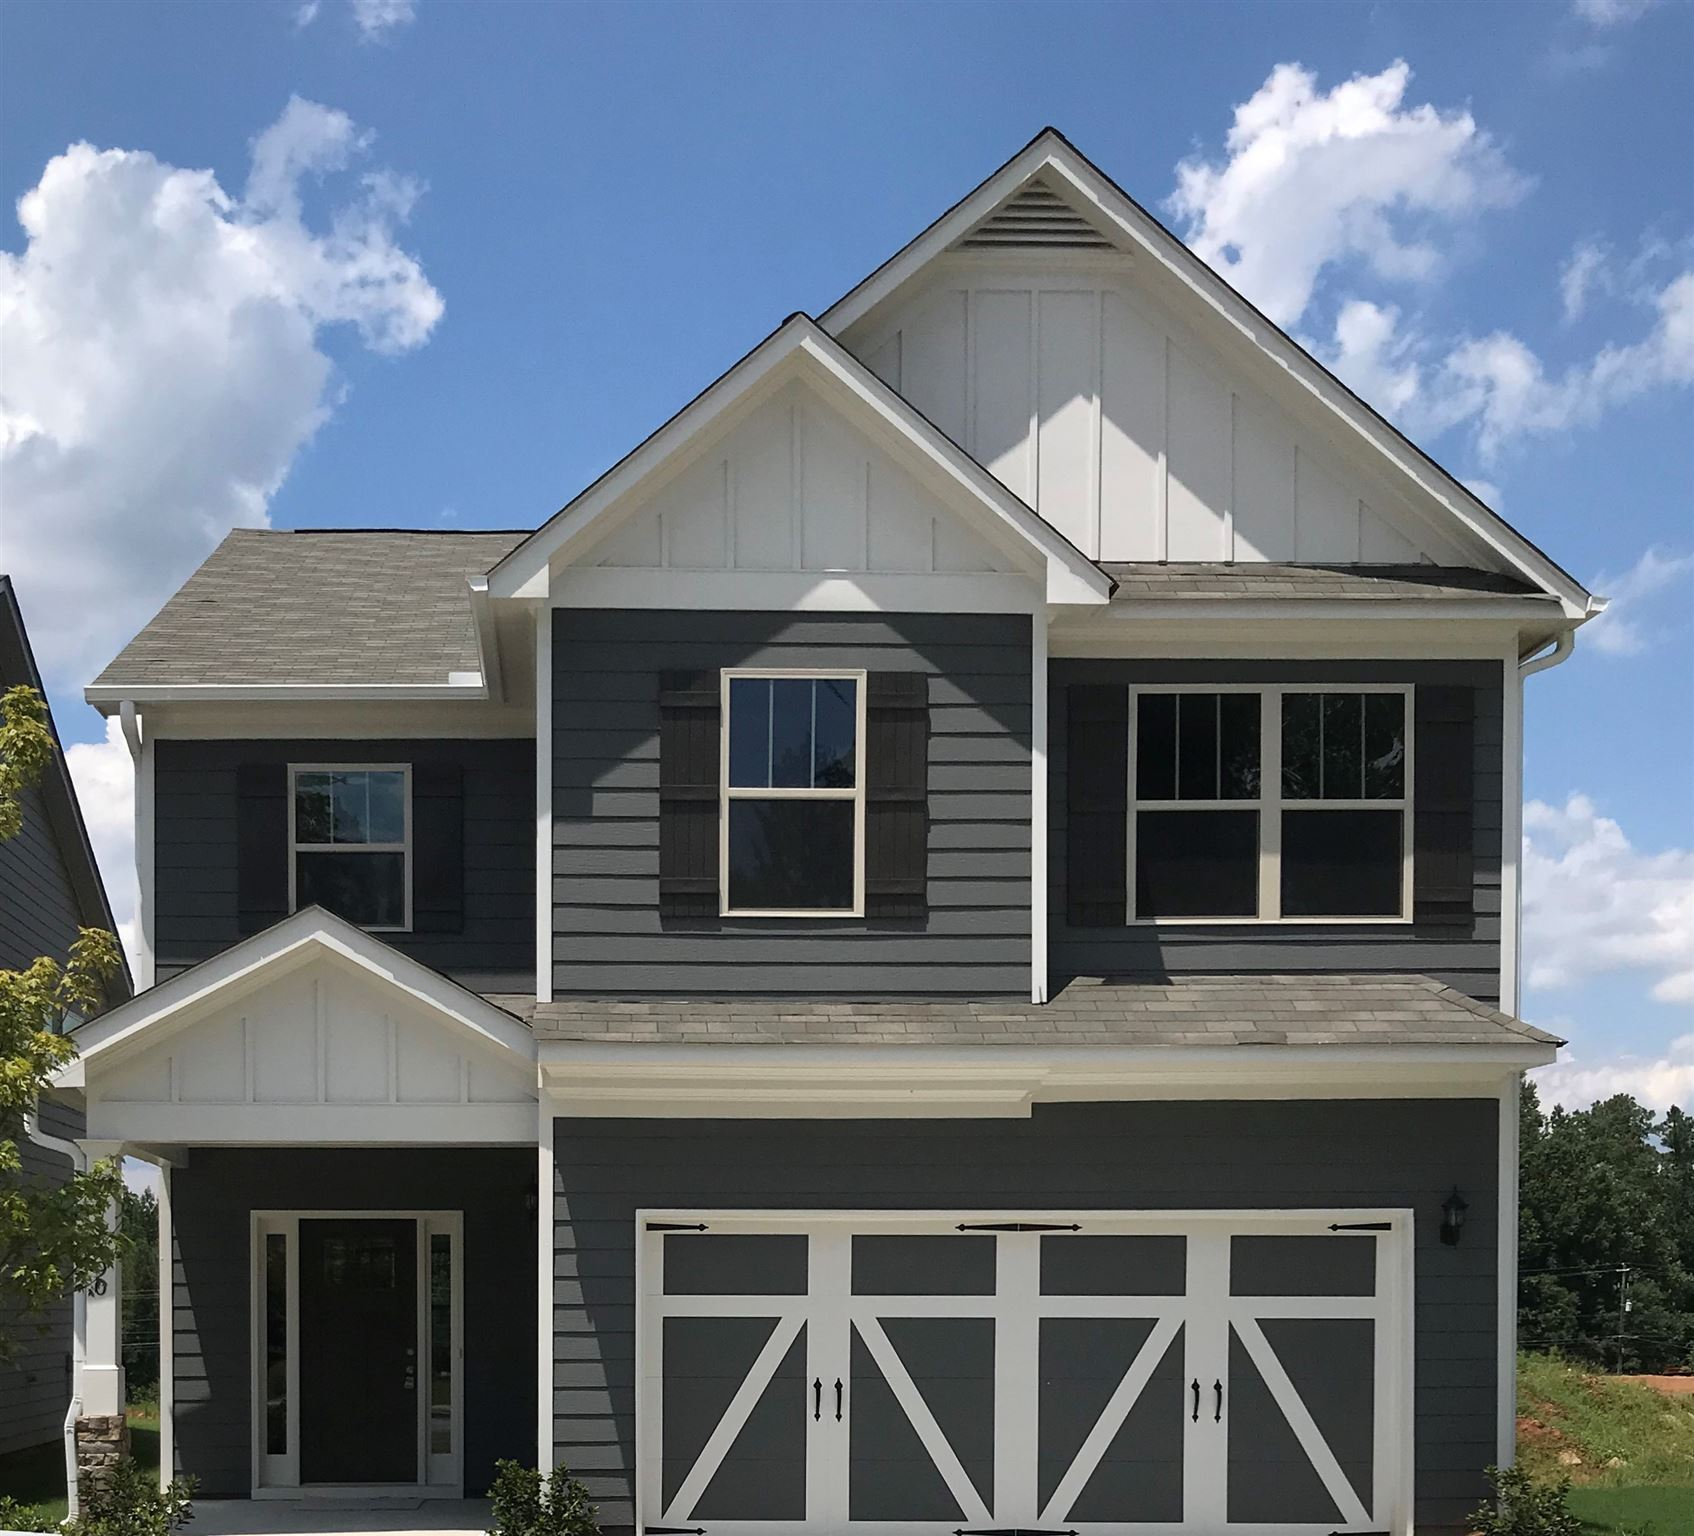 591 Omnia Ct, Lawrenceville, GA 30044 - MLS#: 8861355